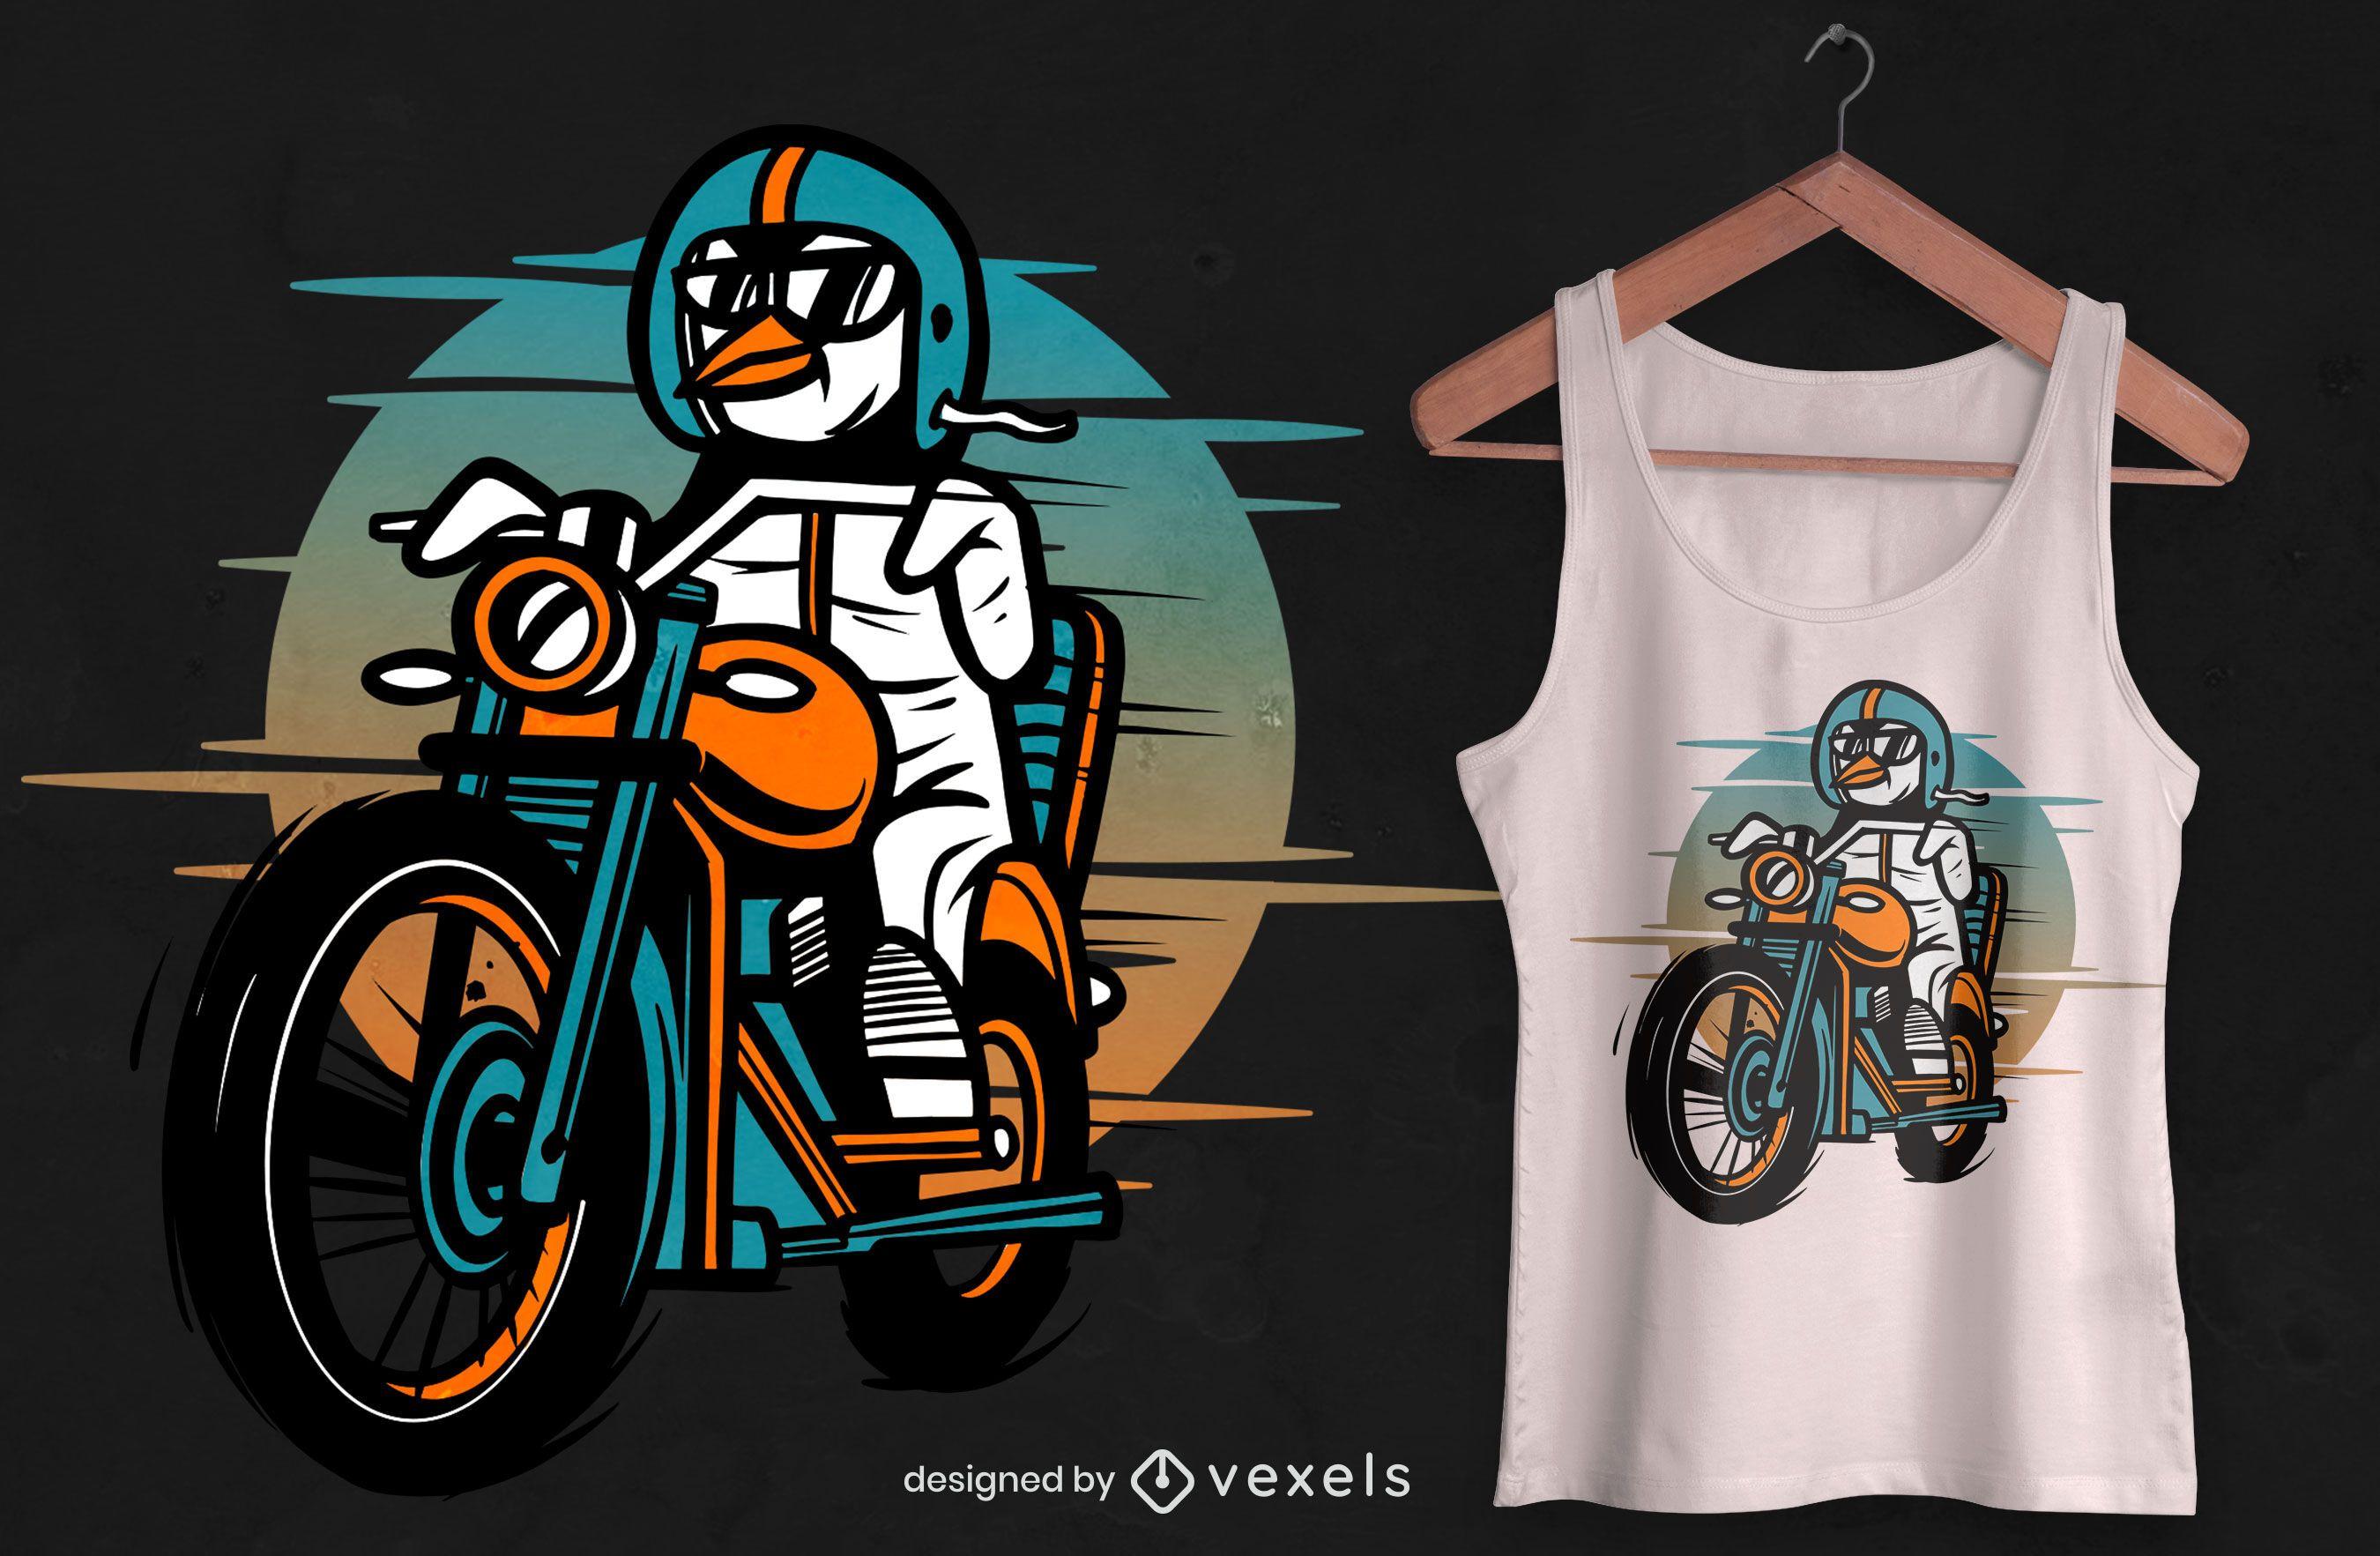 Penguin driving motorcycle t-shirt design